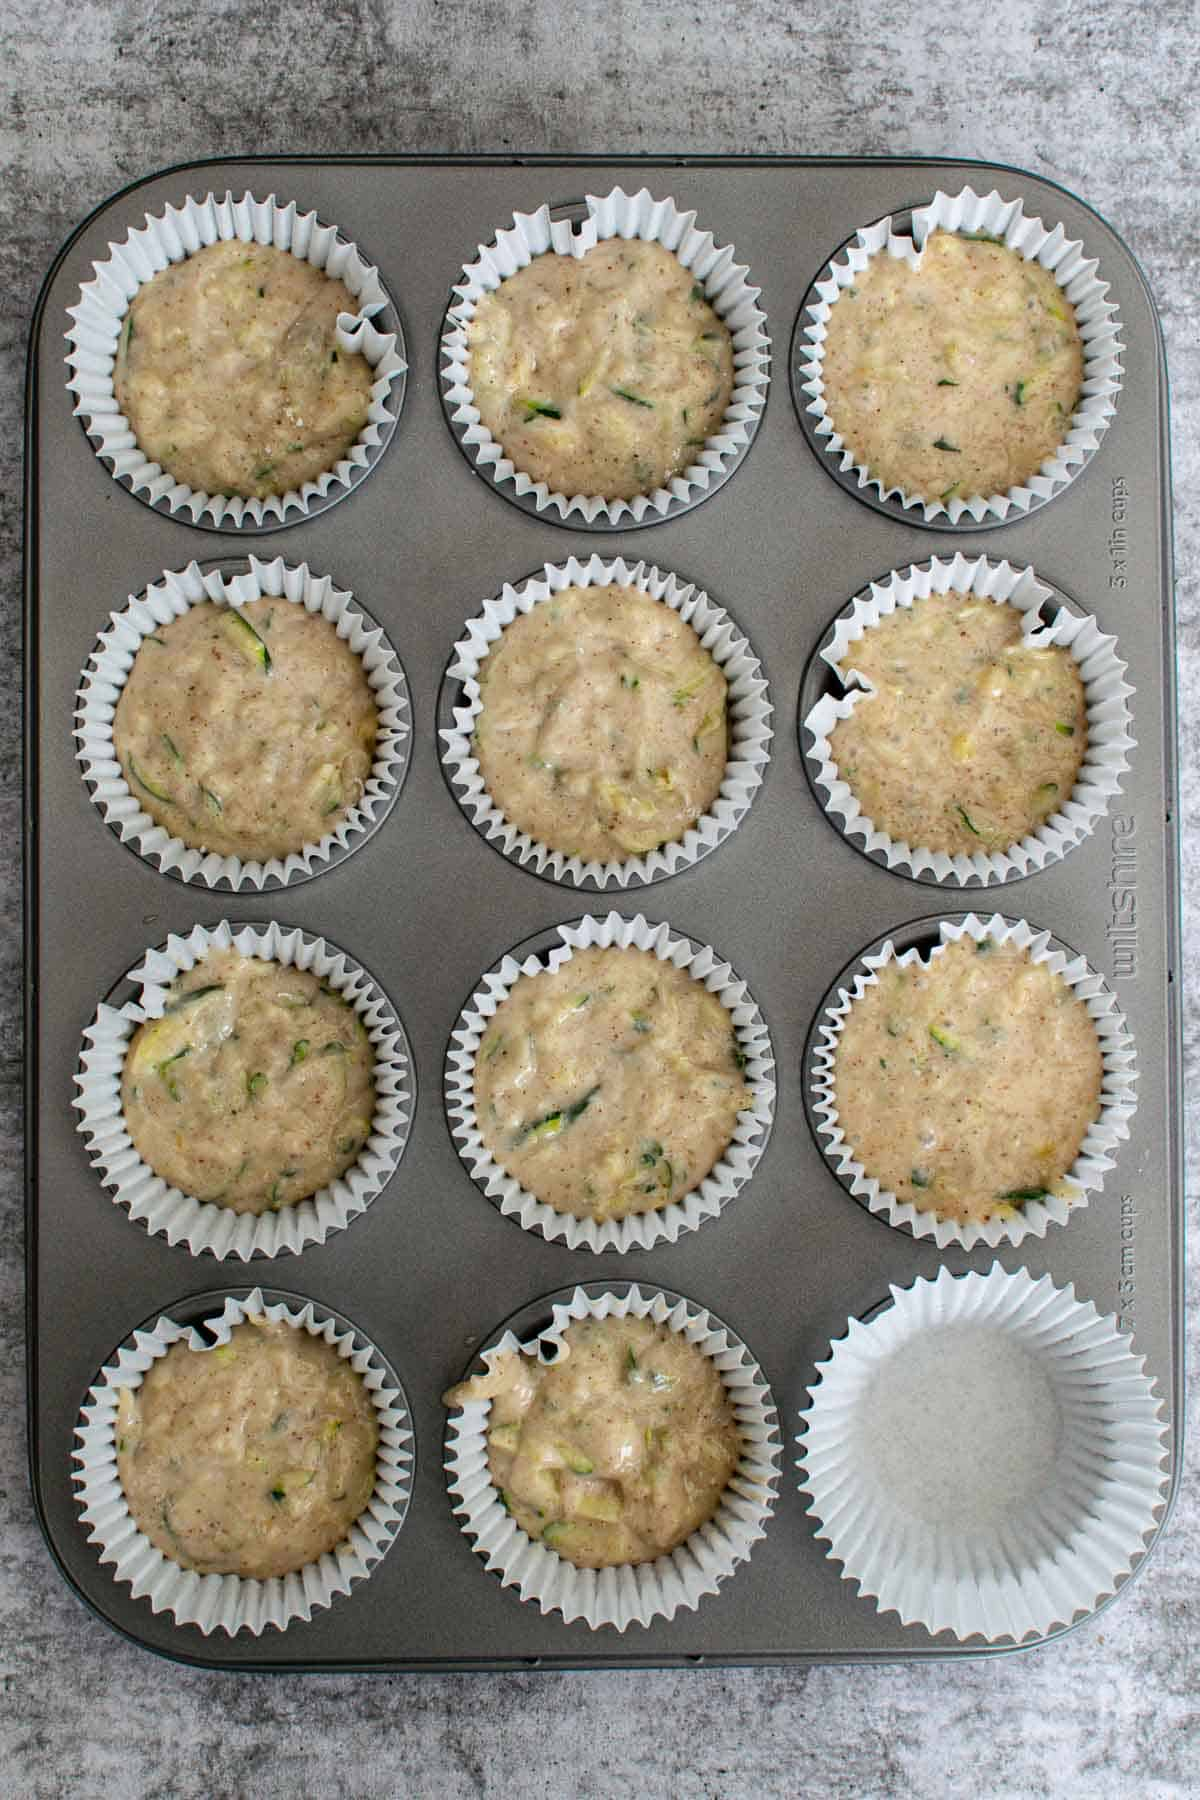 Gluten free zucchini muffin batter in a muffin pan ready to bake.